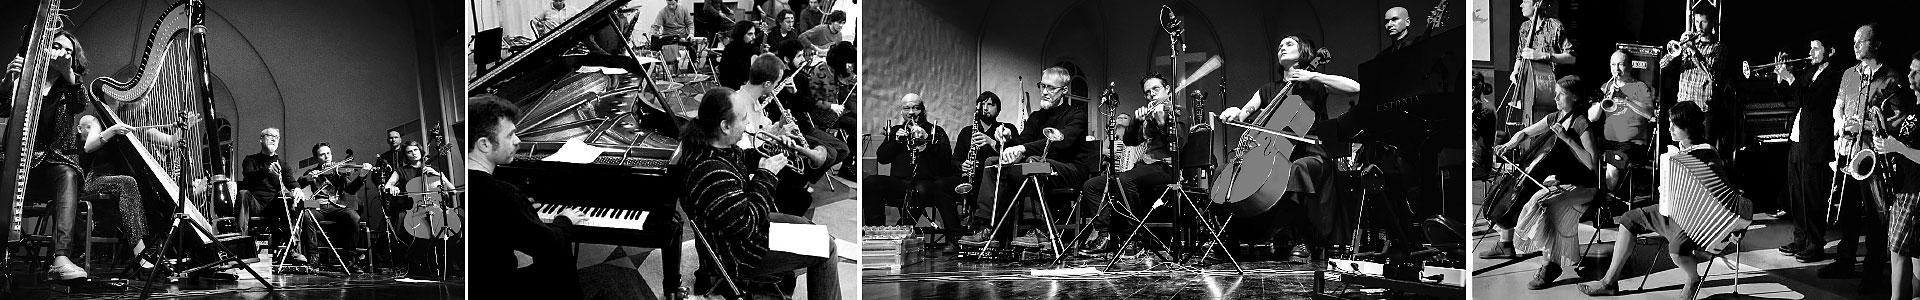 St.Petersburg Improvisers Orchestra